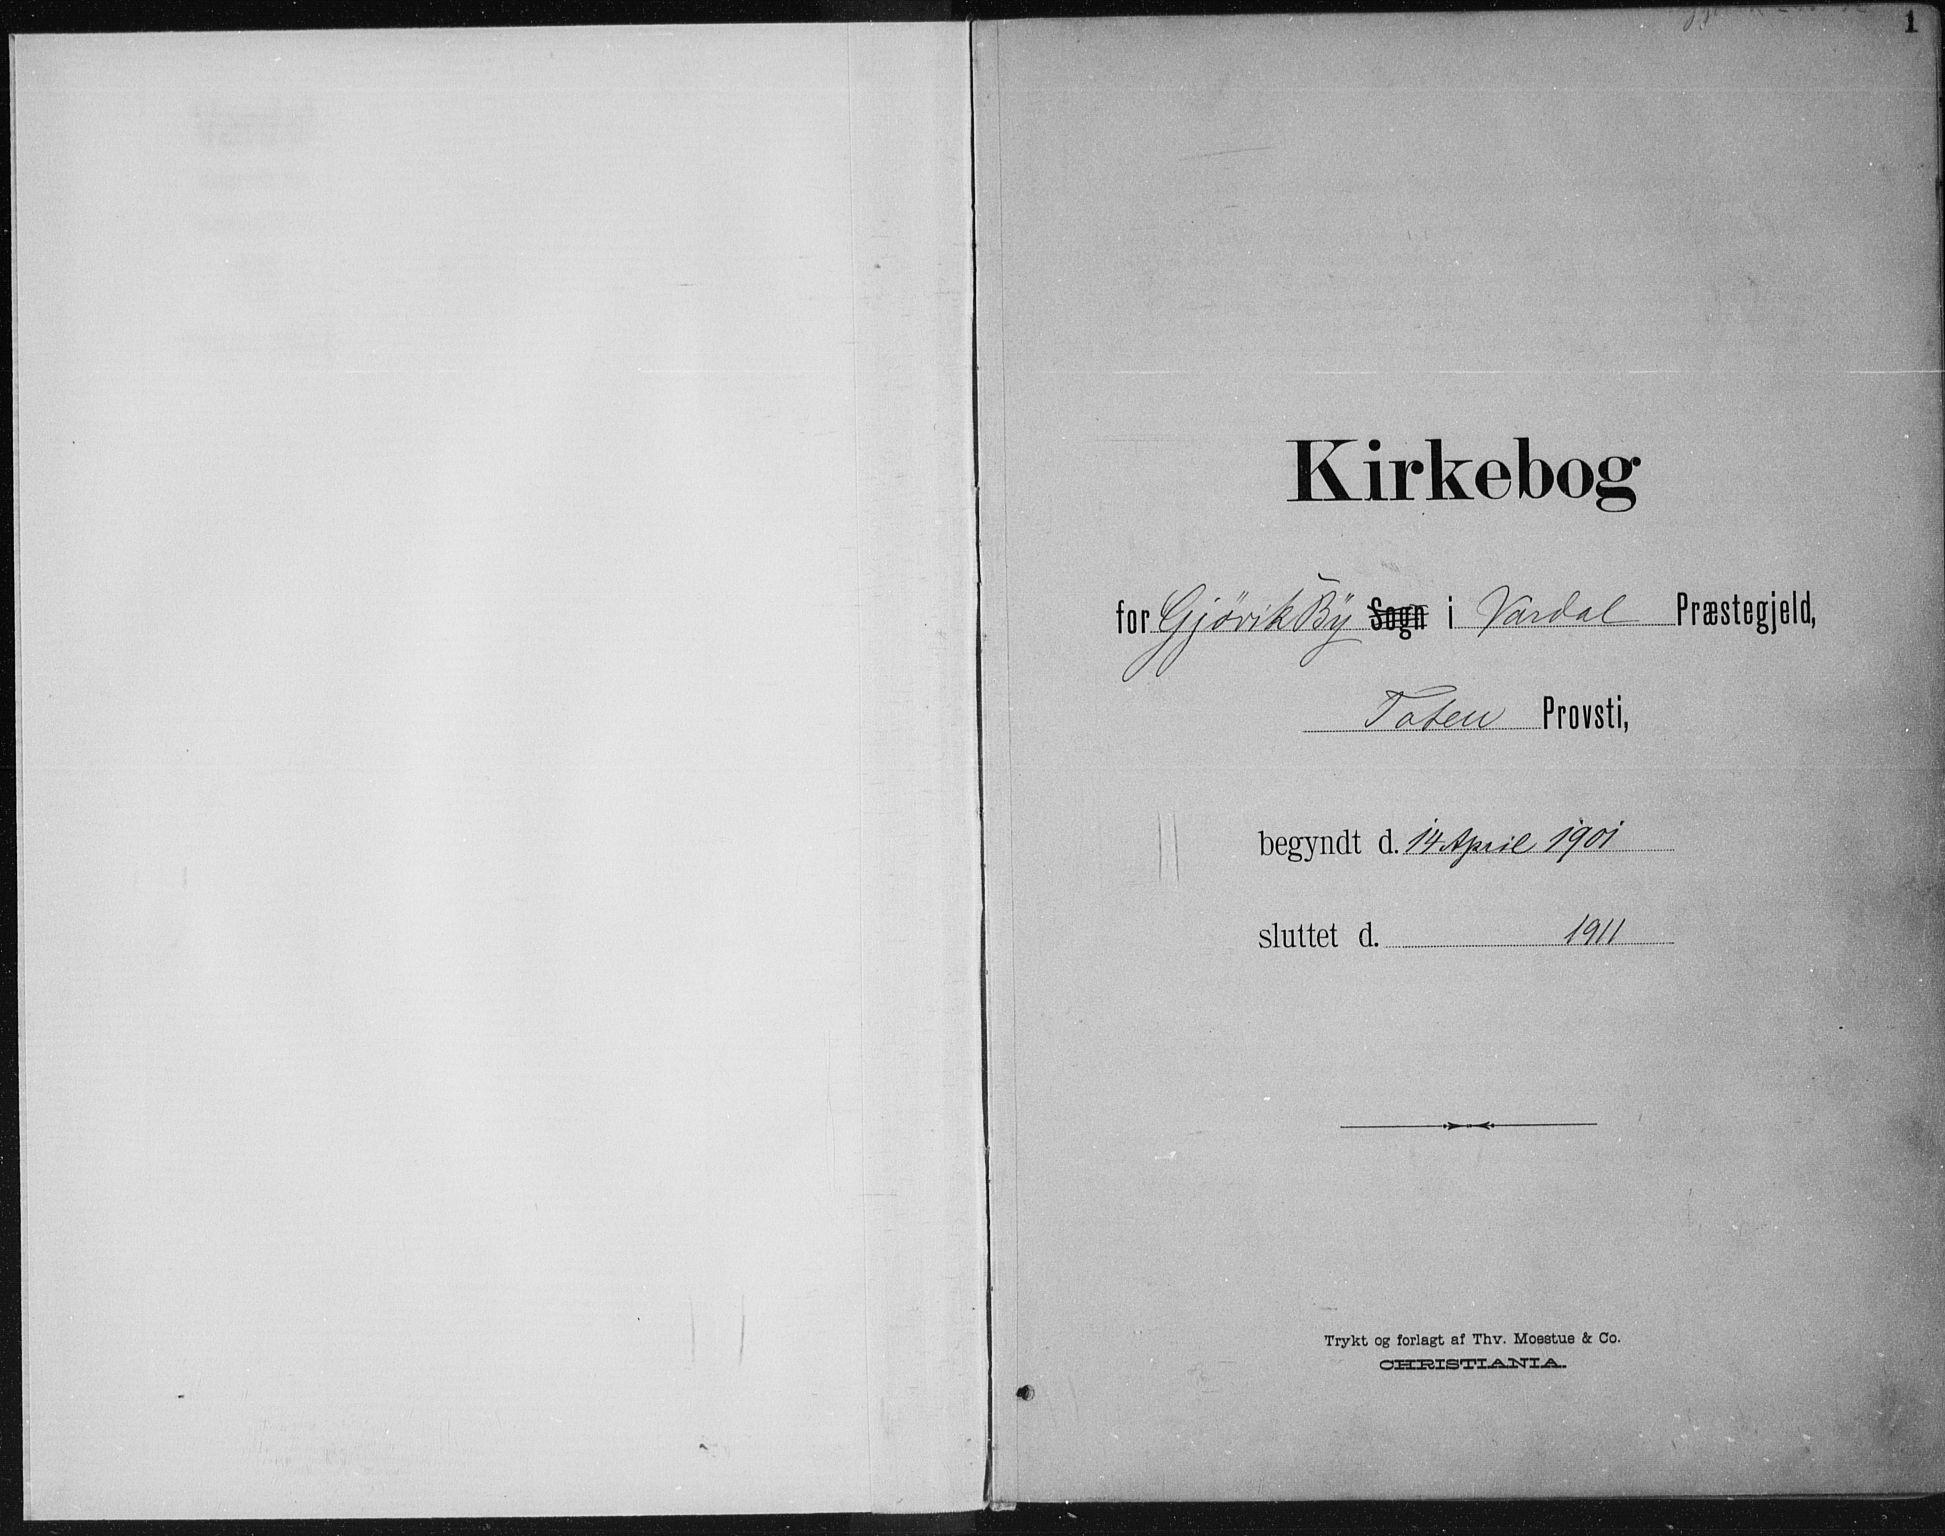 SAH, Vardal prestekontor, H/Ha/Haa/L0013: Ministerialbok nr. 13, 1901-1911, s. 1